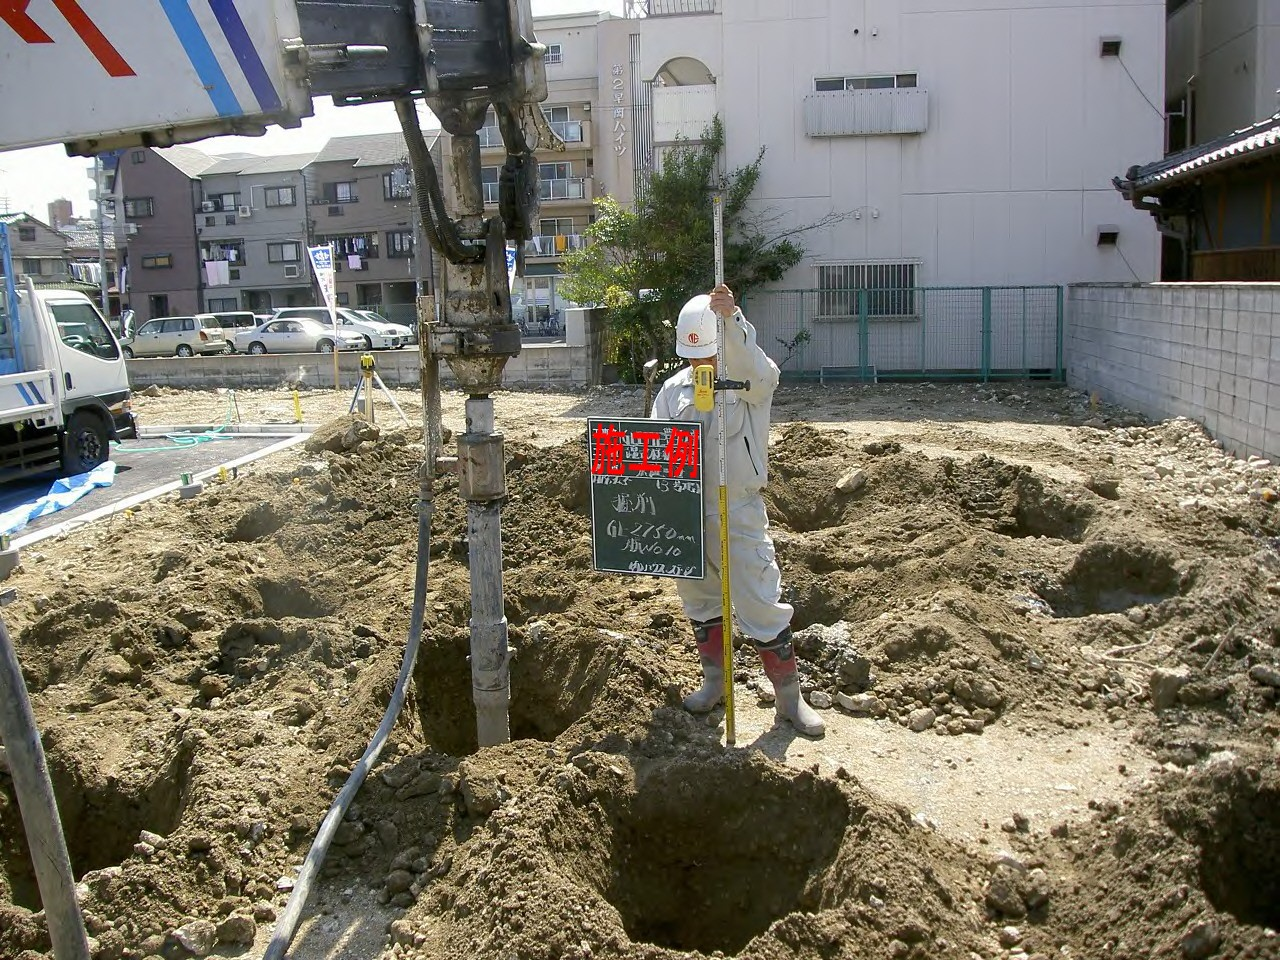 6 Nam khoan giếng nước ngầm tại Fukuoka 12/2014